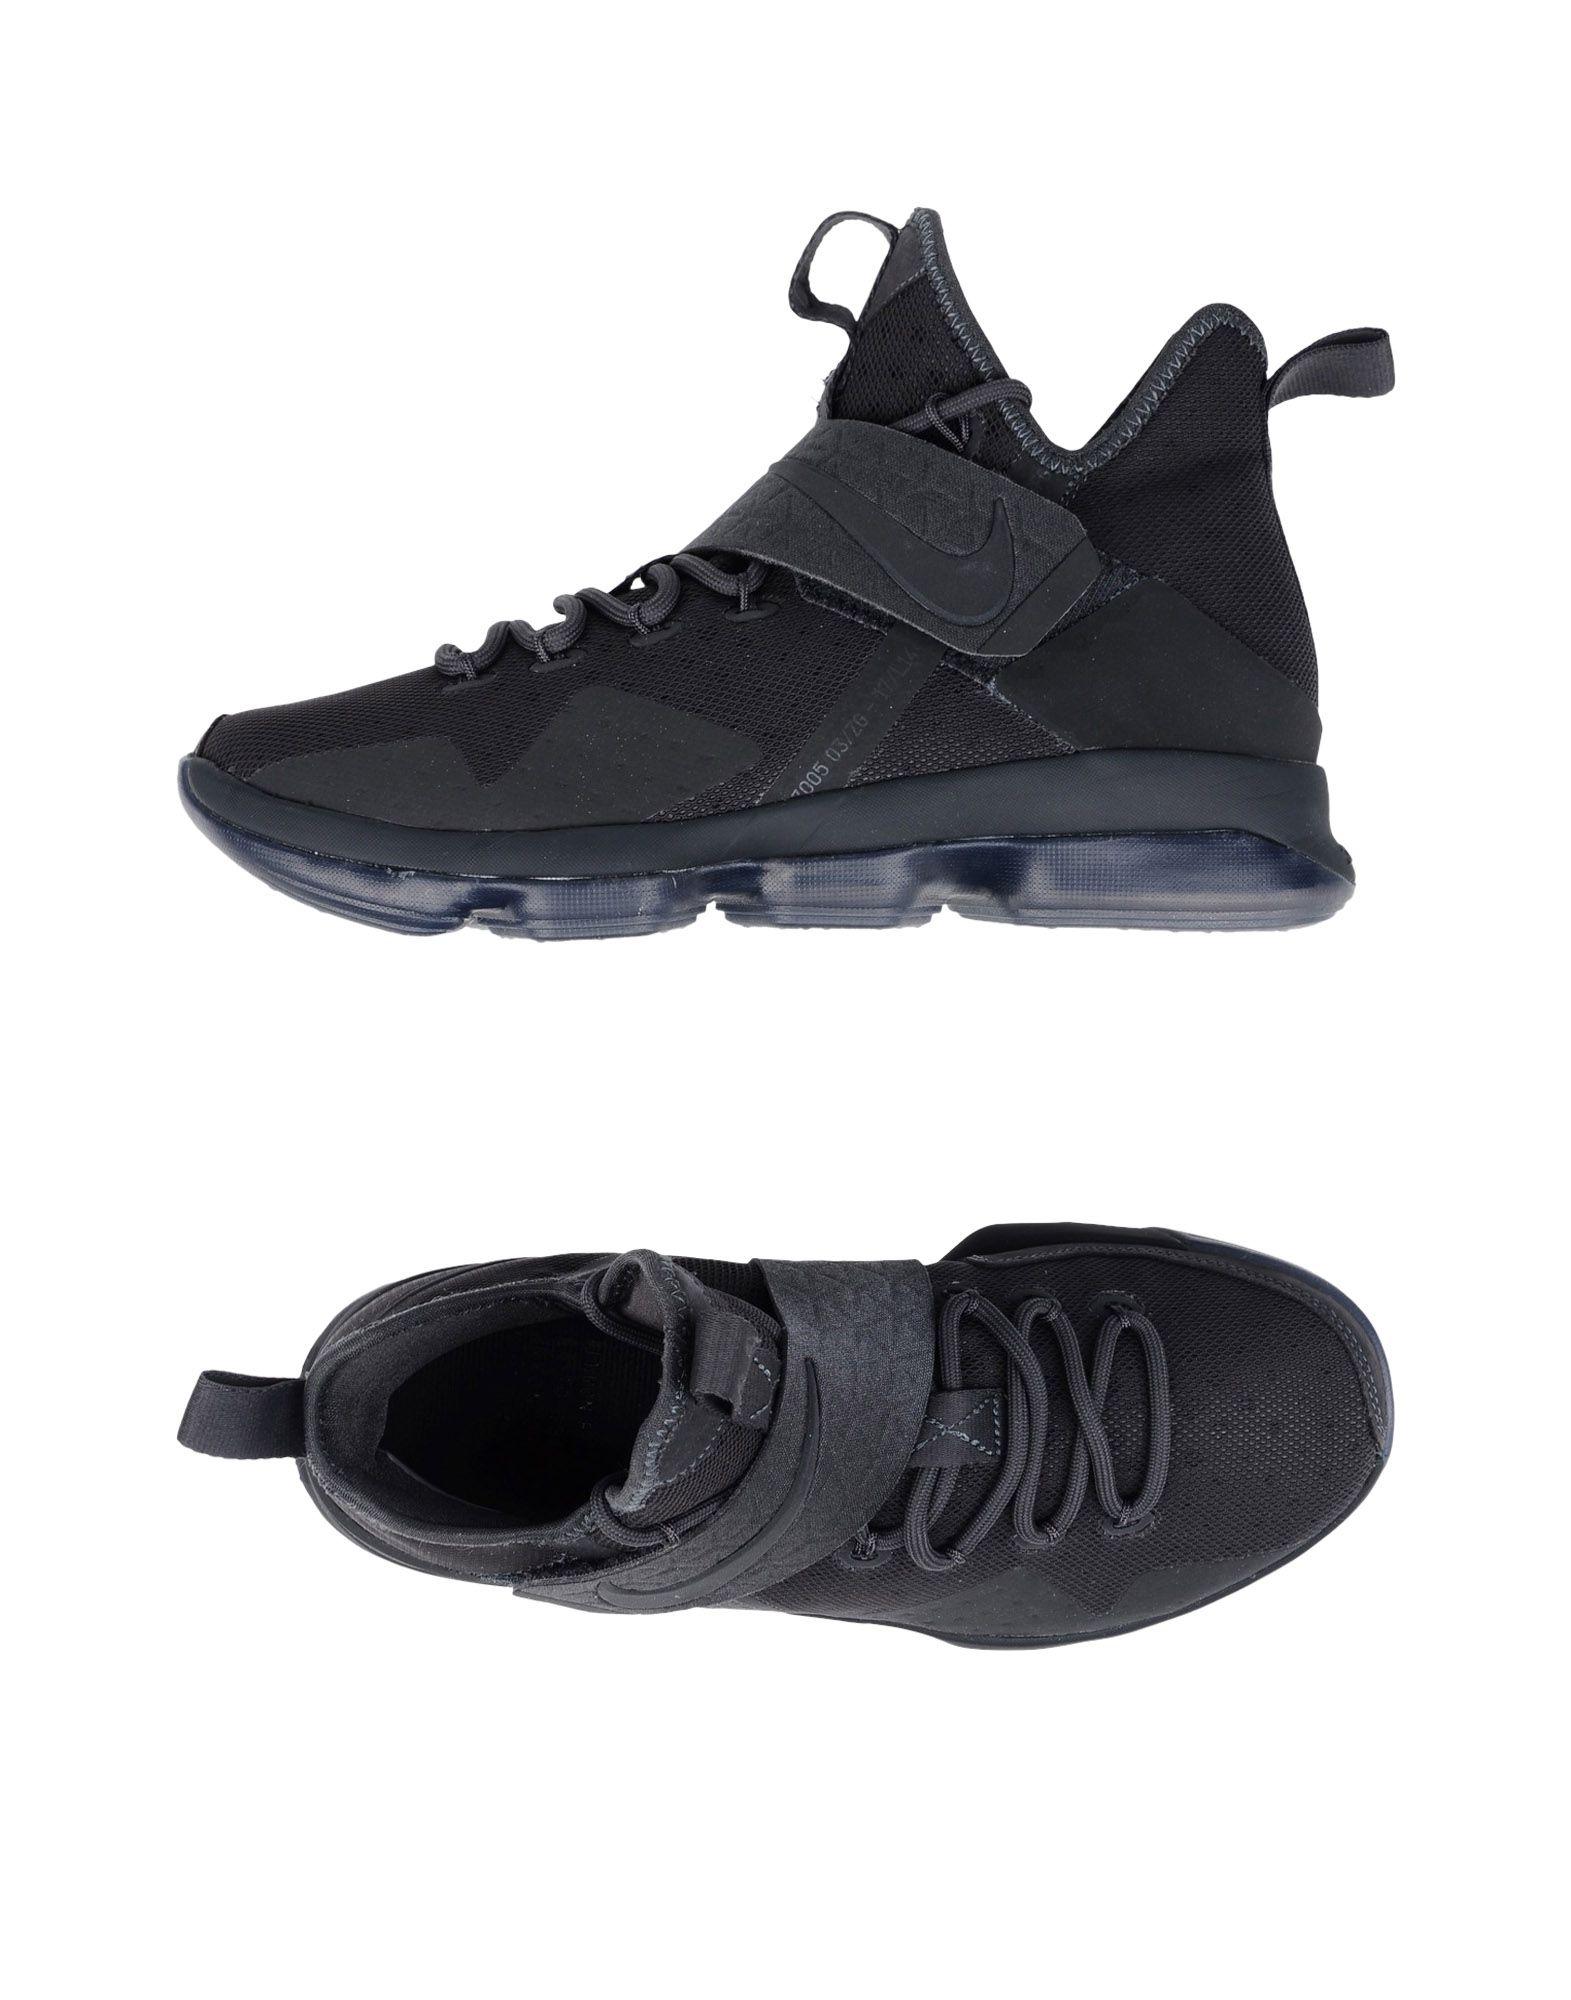 NIKE Высокие кеды и кроссовки кеды кроссовки высокие dc council mid tx stone camo